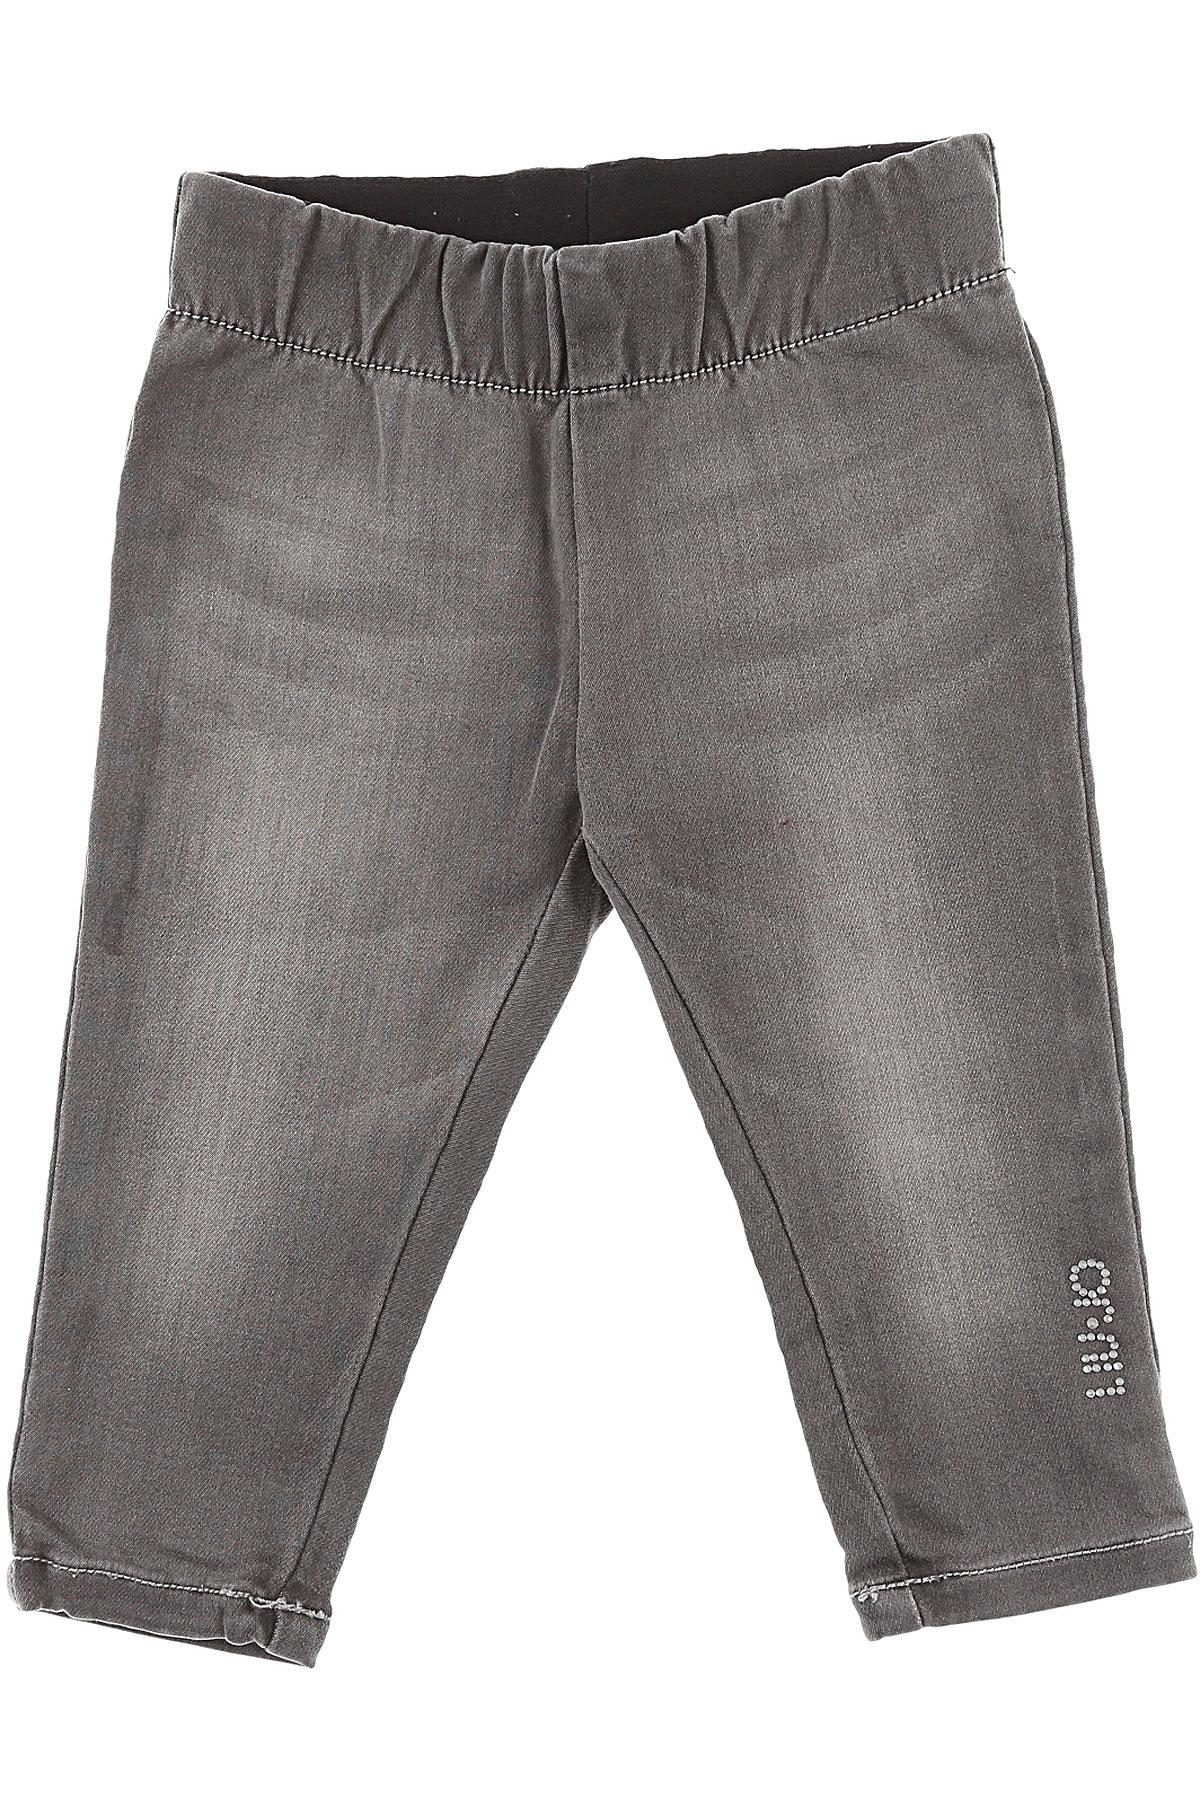 Image of Liu Jo Baby Pants for Girls, Denim Grey, Cotton, 2017, 12M 18M 6M 9M